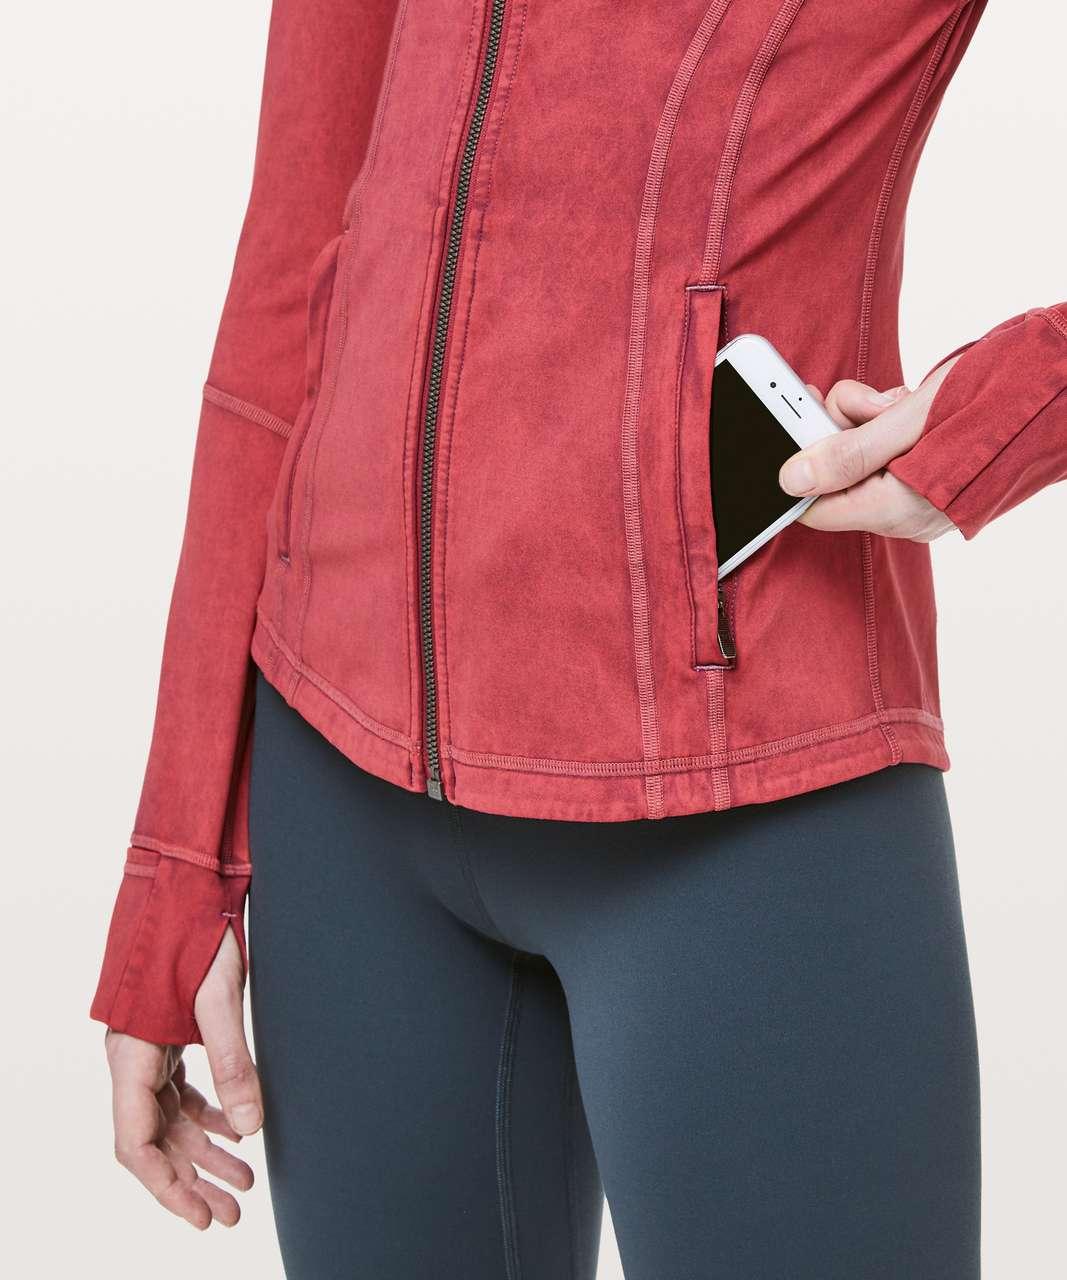 Lululemon Define Jacket *Garment Dye - Washed Misty Merlot